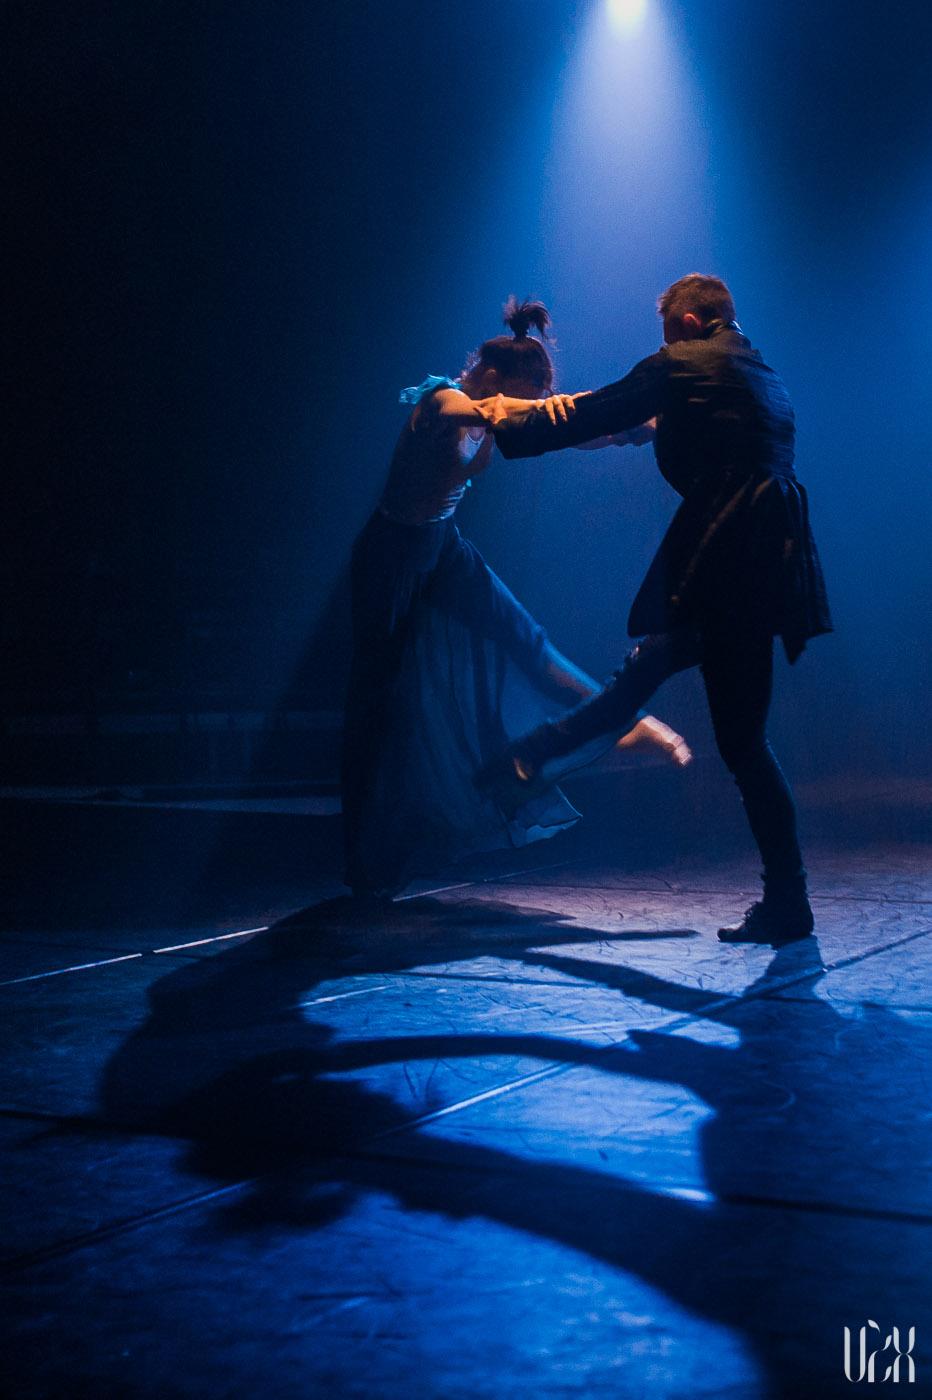 E.sabaliauskaite Vzx.lt Faustas Teatras Event 007